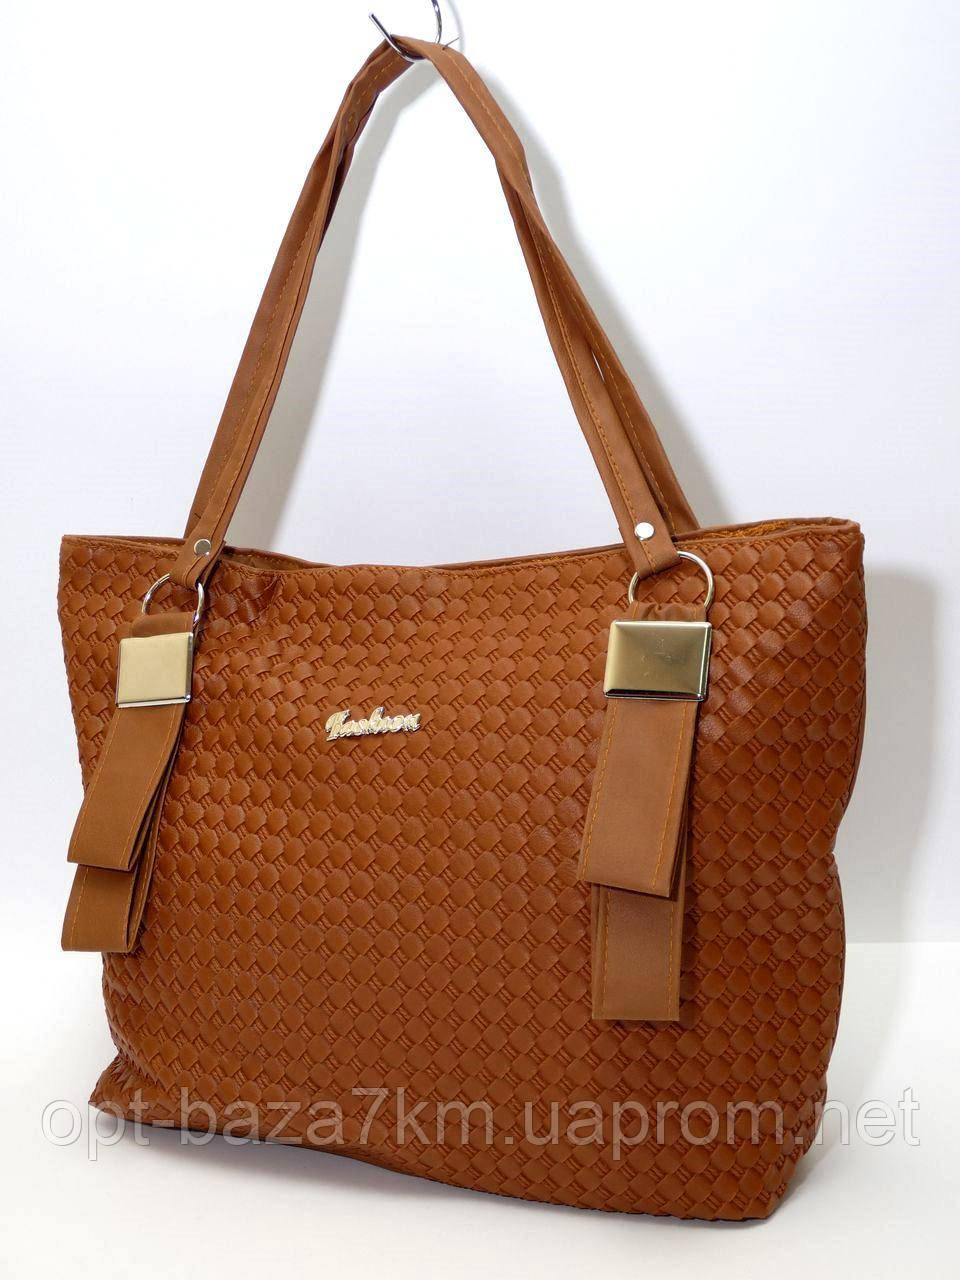 04a7892ec23e Женская сумка (40х30х13), Турция - Интернет-магазин «Оптовая База 7 км